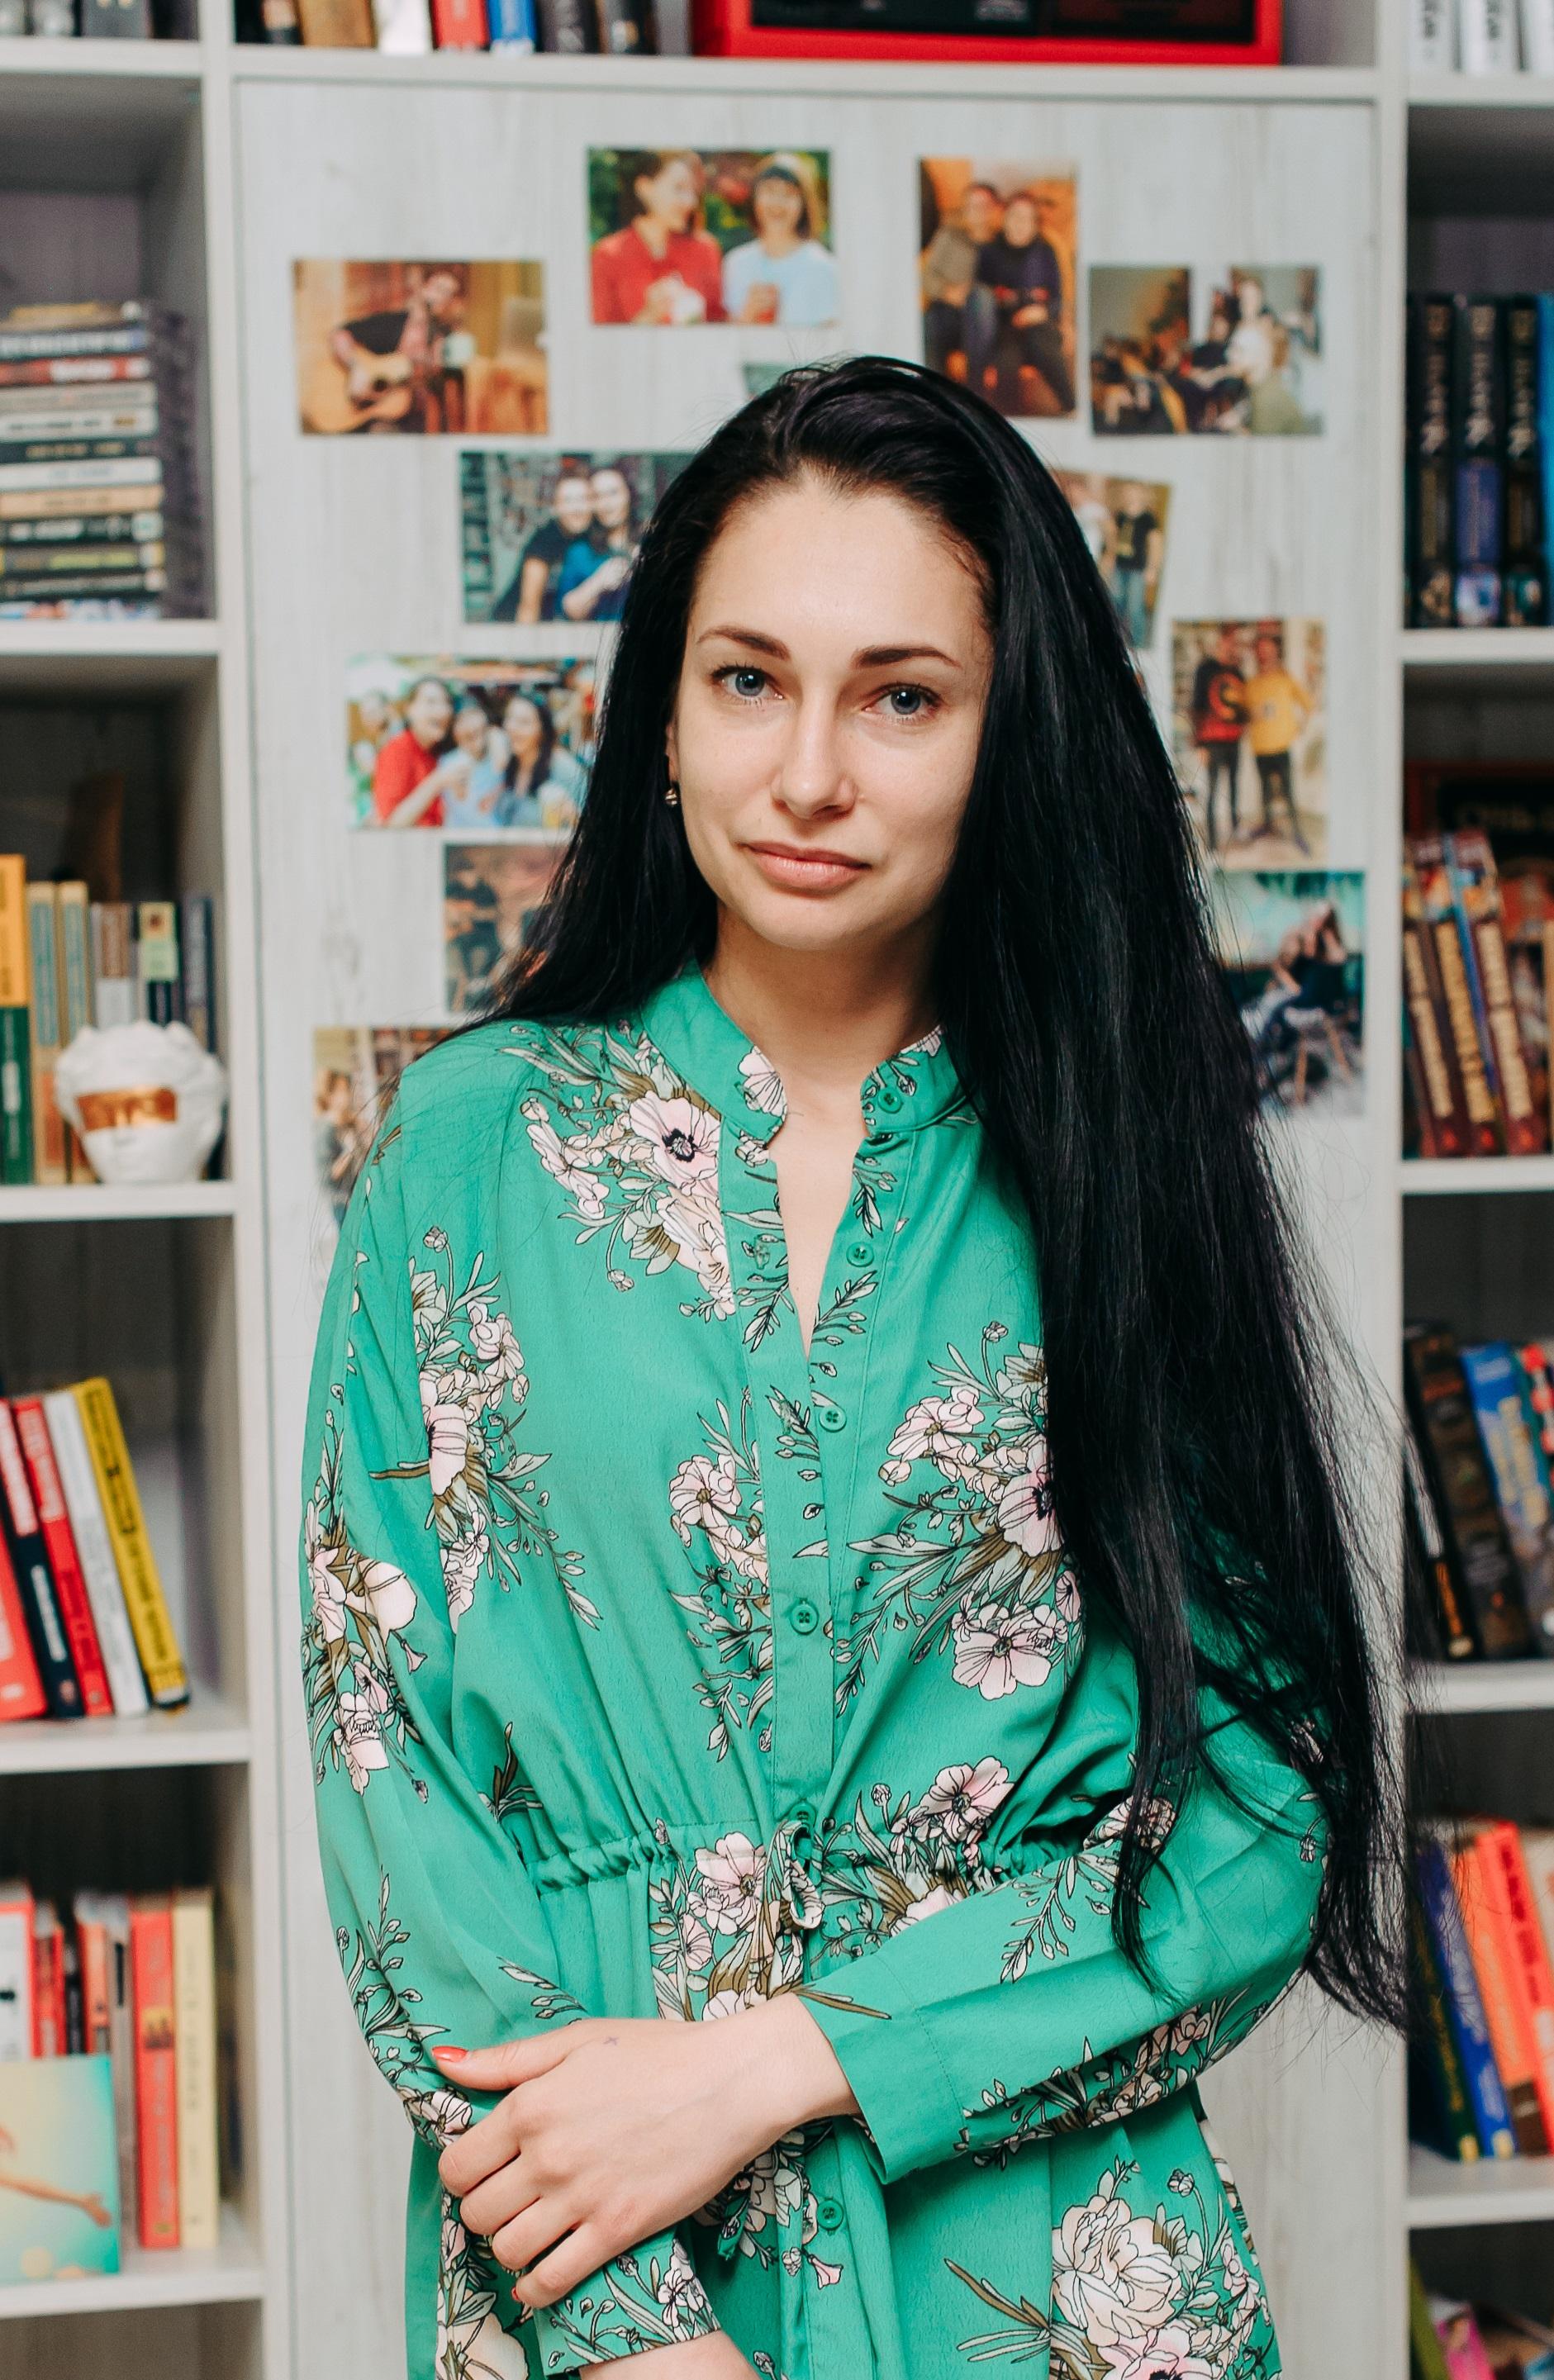 Бінчева Поліна Генадіївна